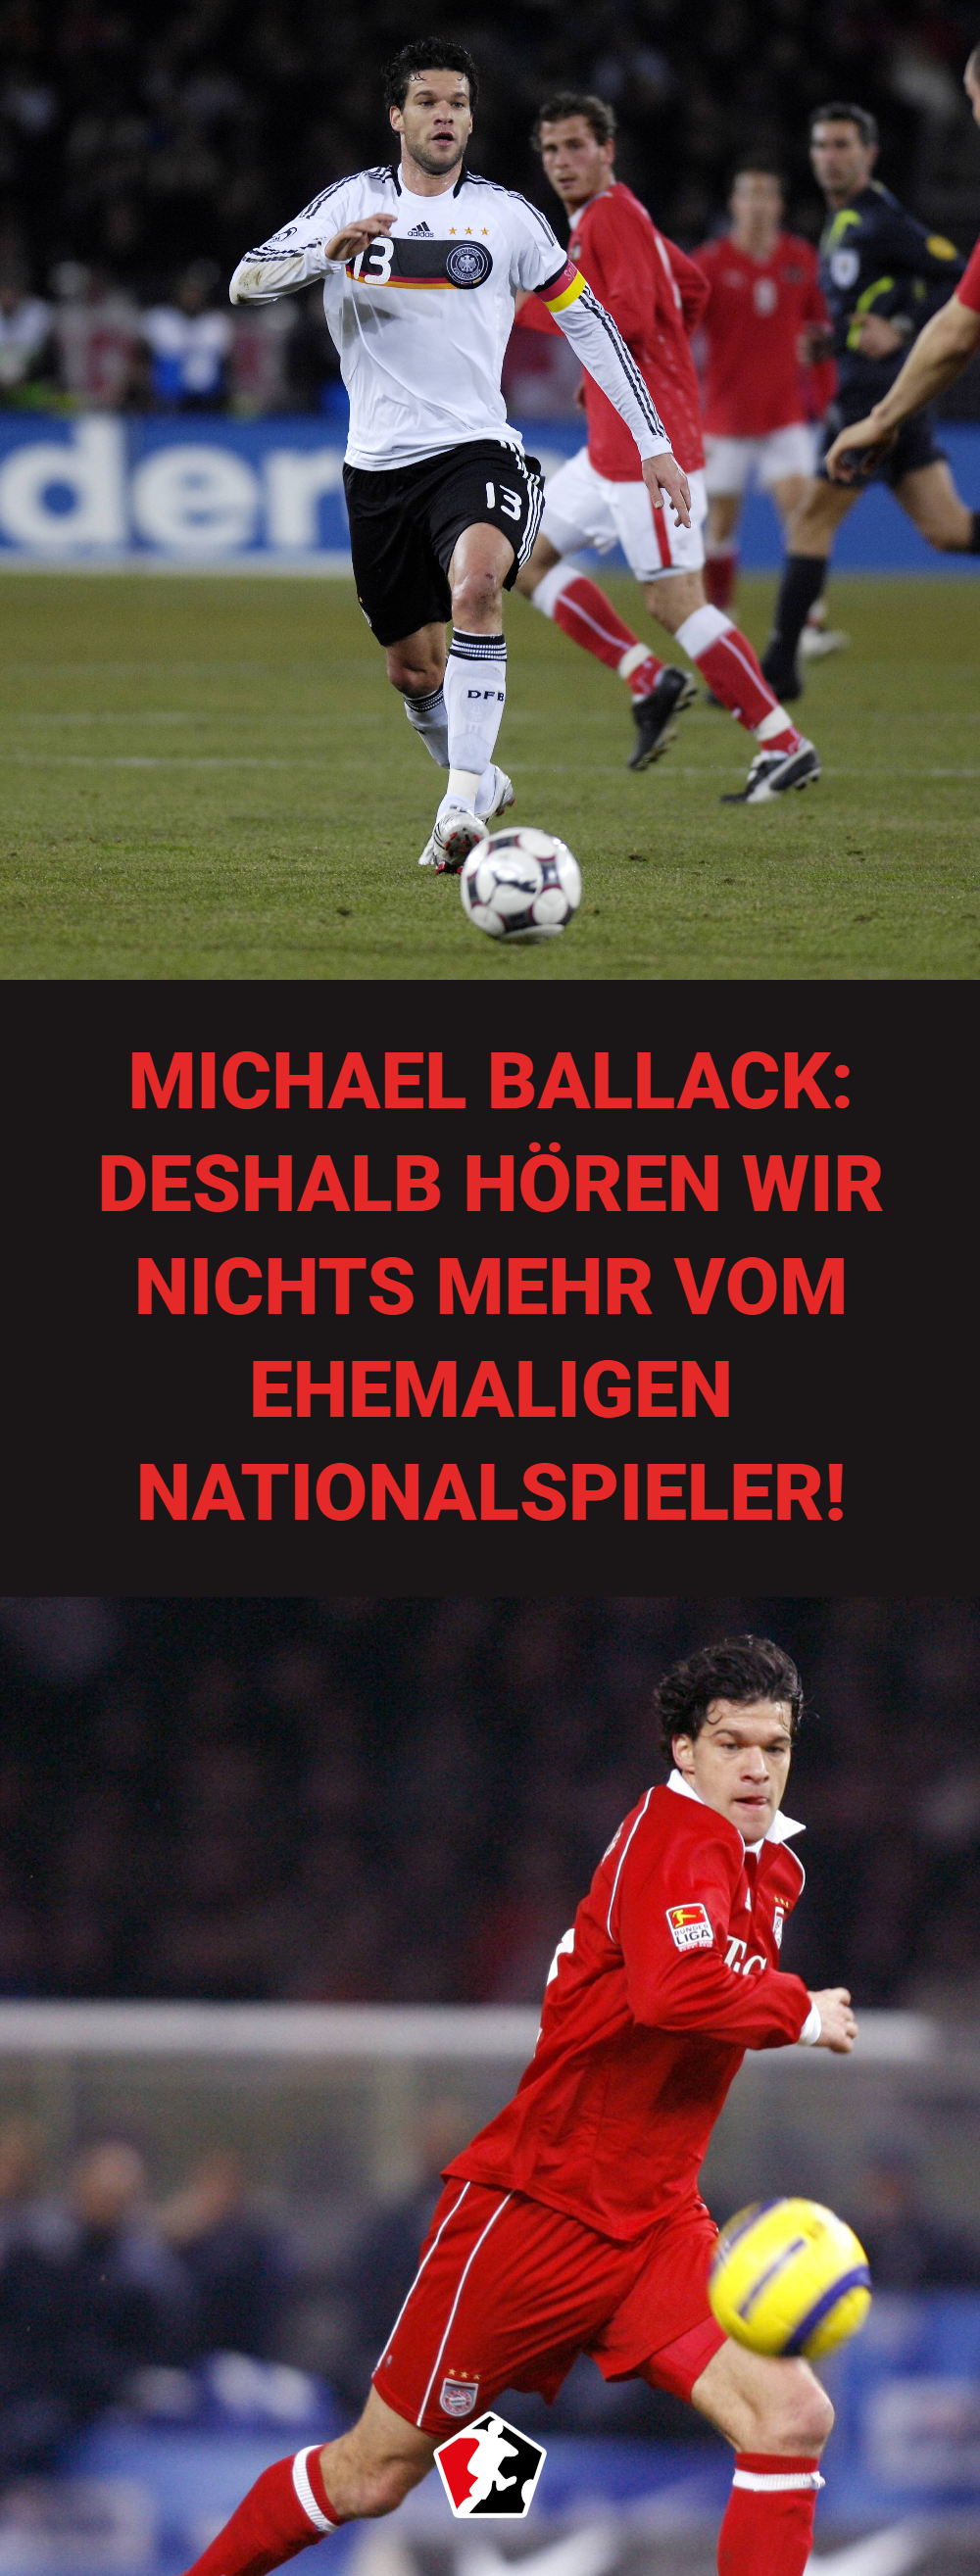 Viele Erinnern Sich Noch An Den Mittelfeld Spieler Michael Ballack Schliesslich Hat Er Funf Nati Michael Ballack Fussball Nationalmannschaft Fussball Ergebnisse